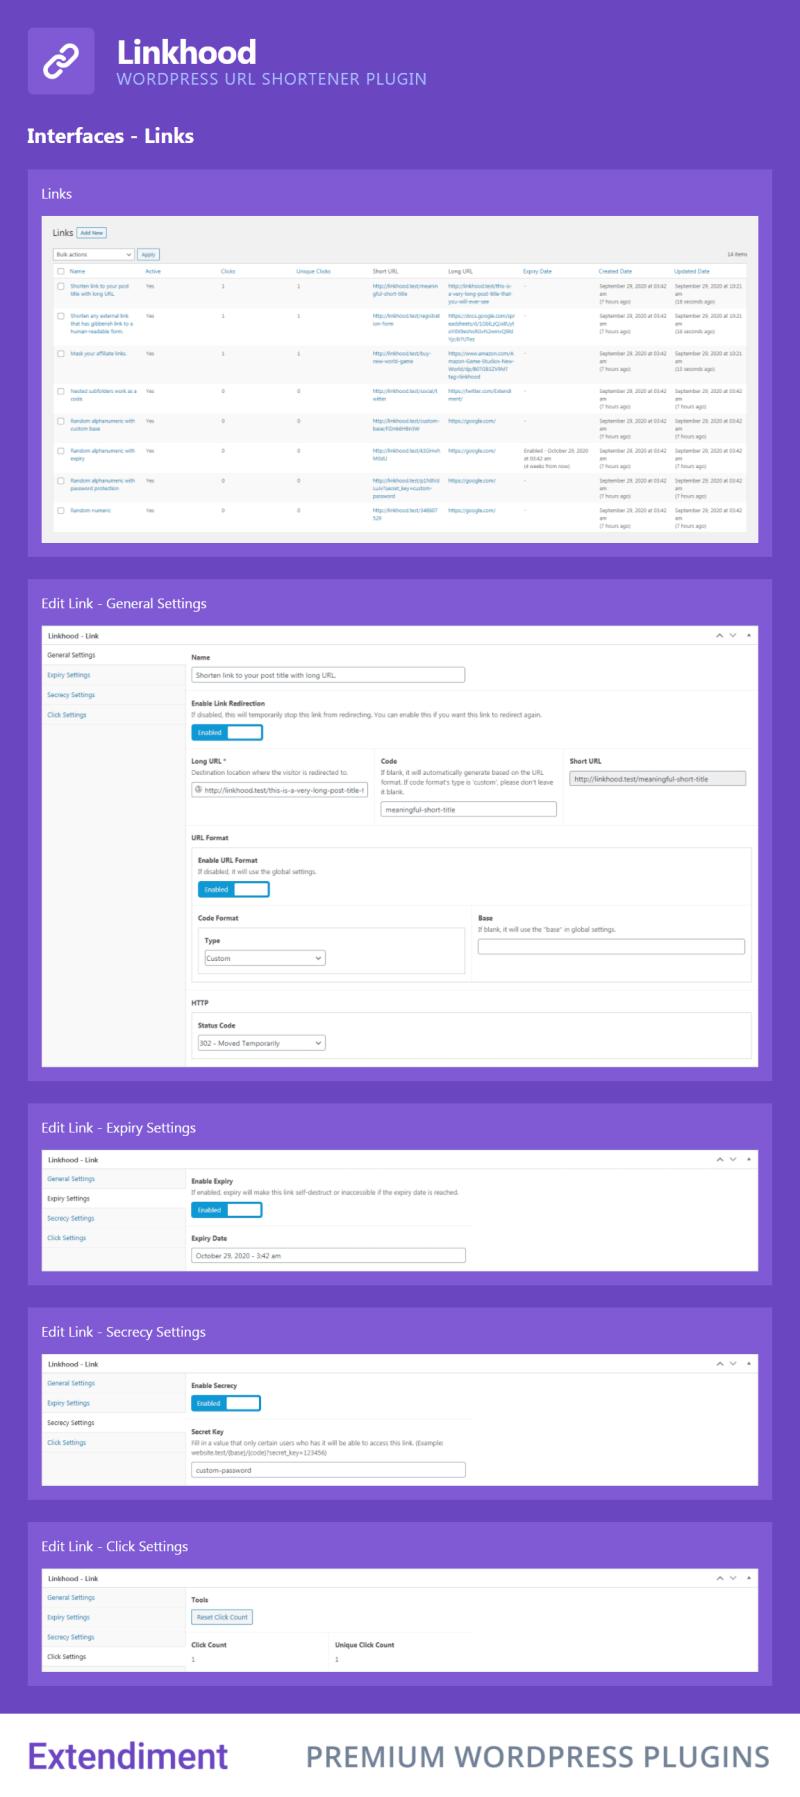 Linkhood - WordPress URL Shortener Plugin - 2